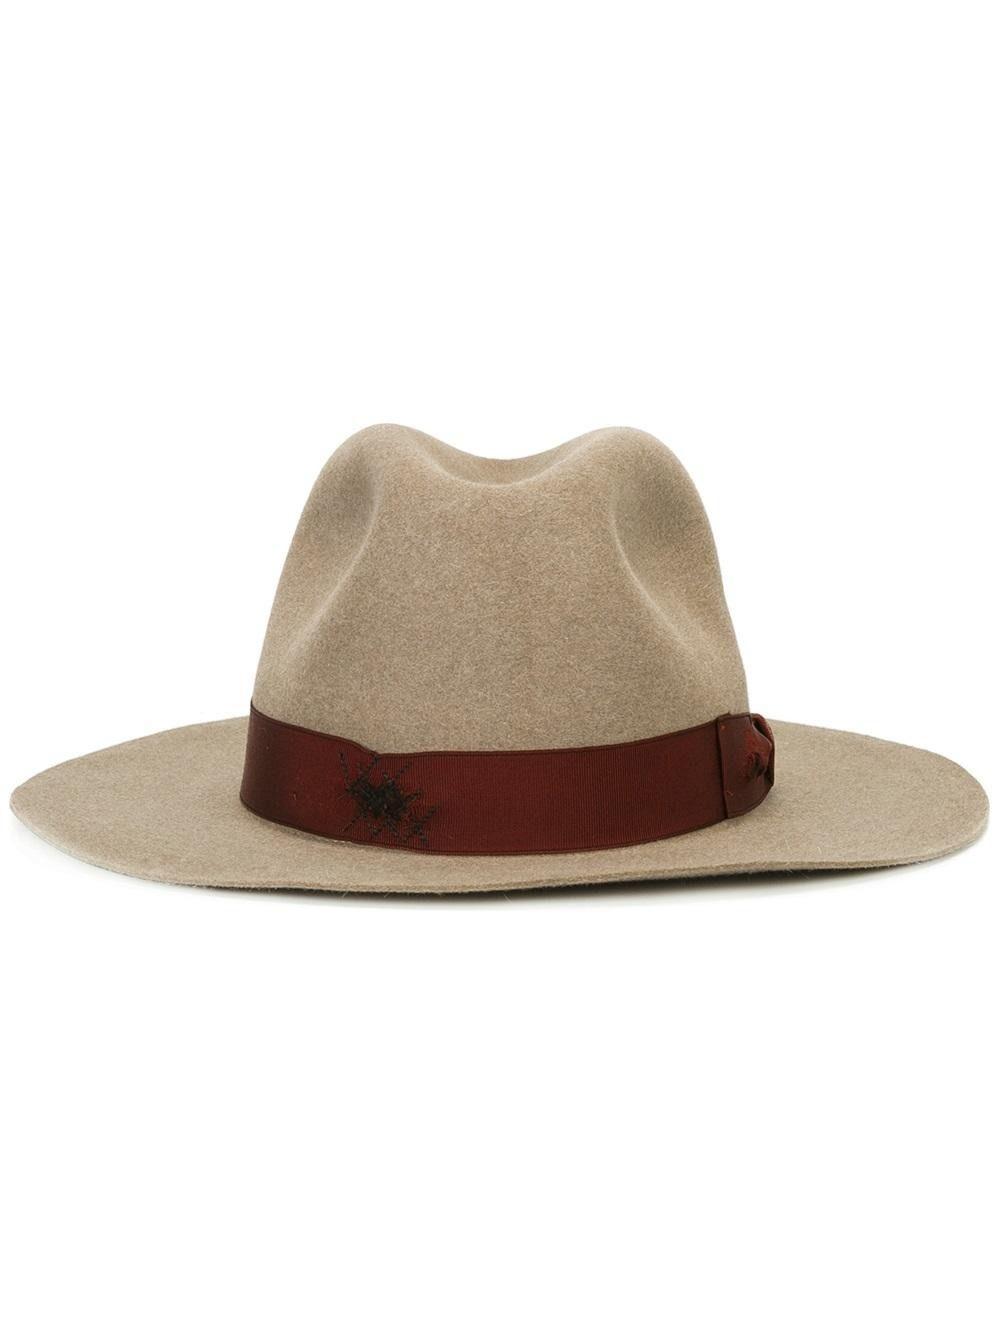 636ec94d7b2 Borsalino Strap Detail Fedora Hat